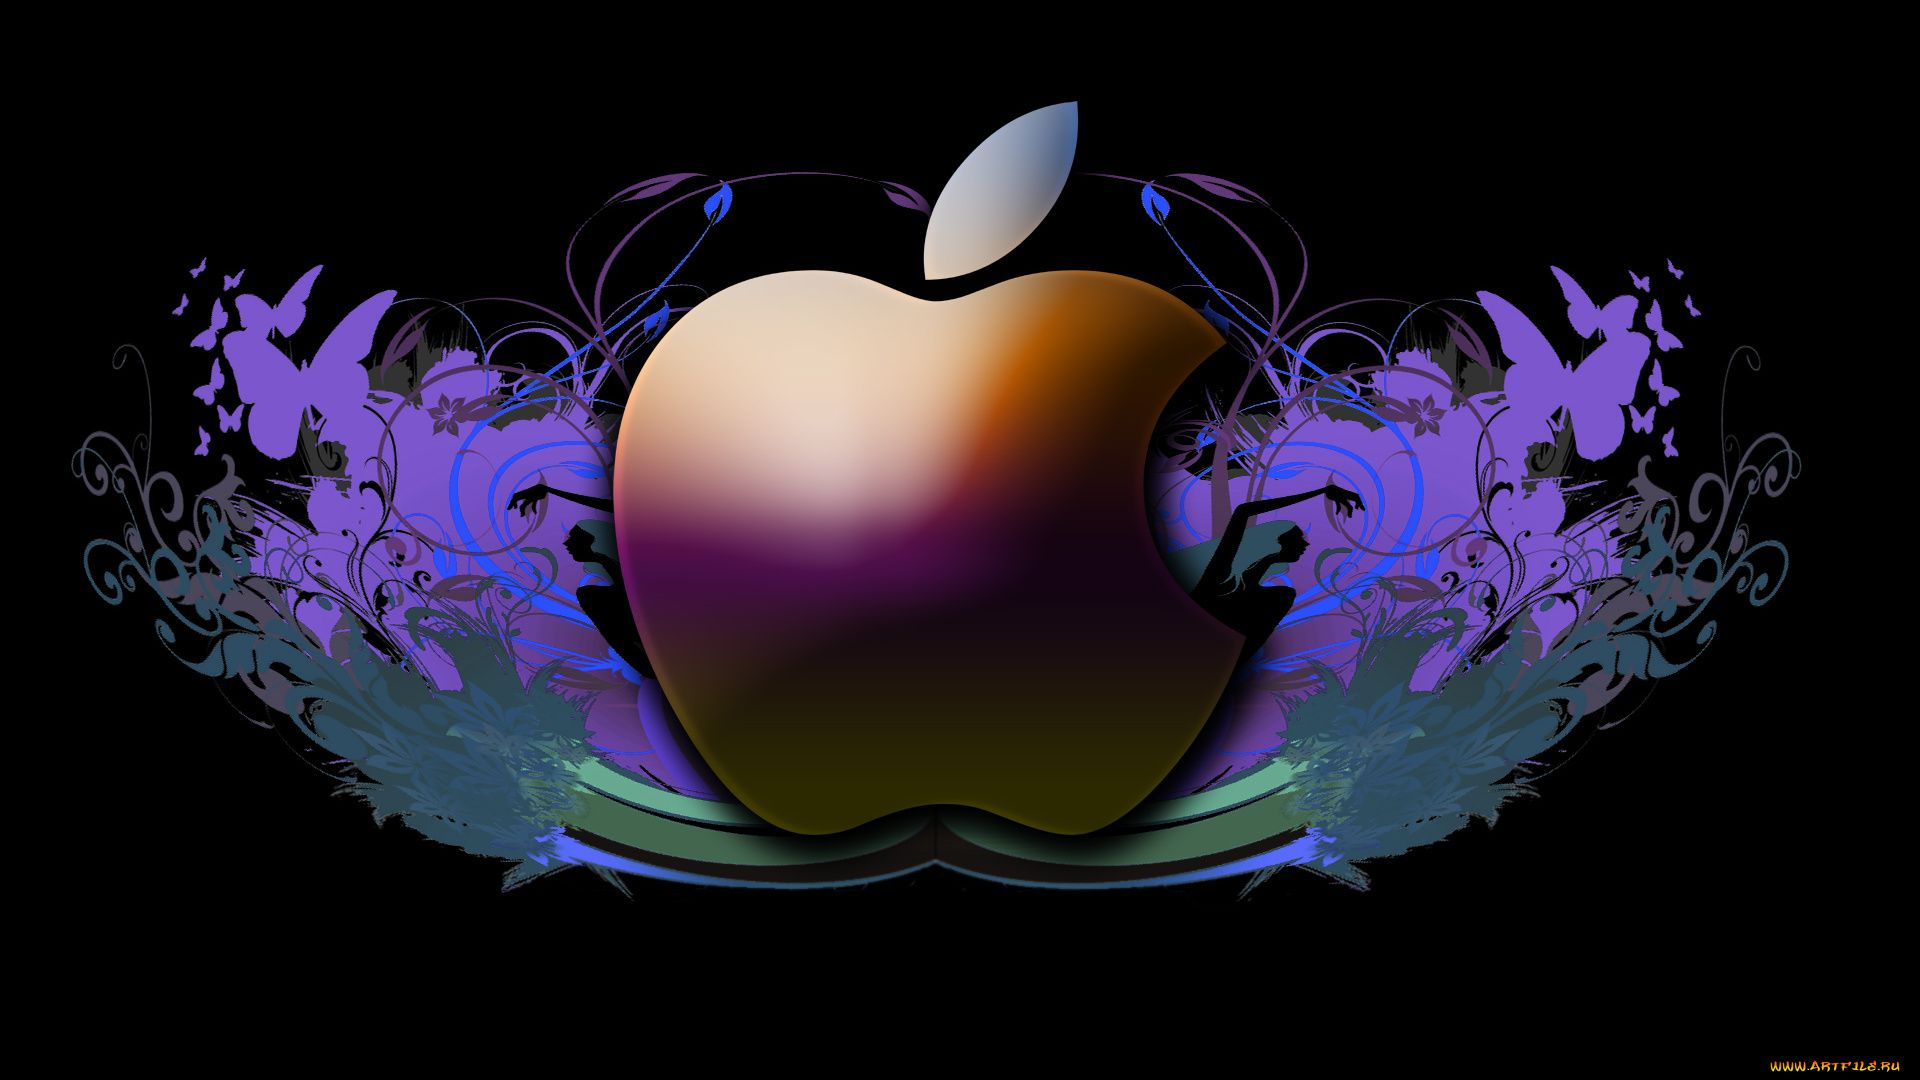 Apple Ipad laptop background wallpaper